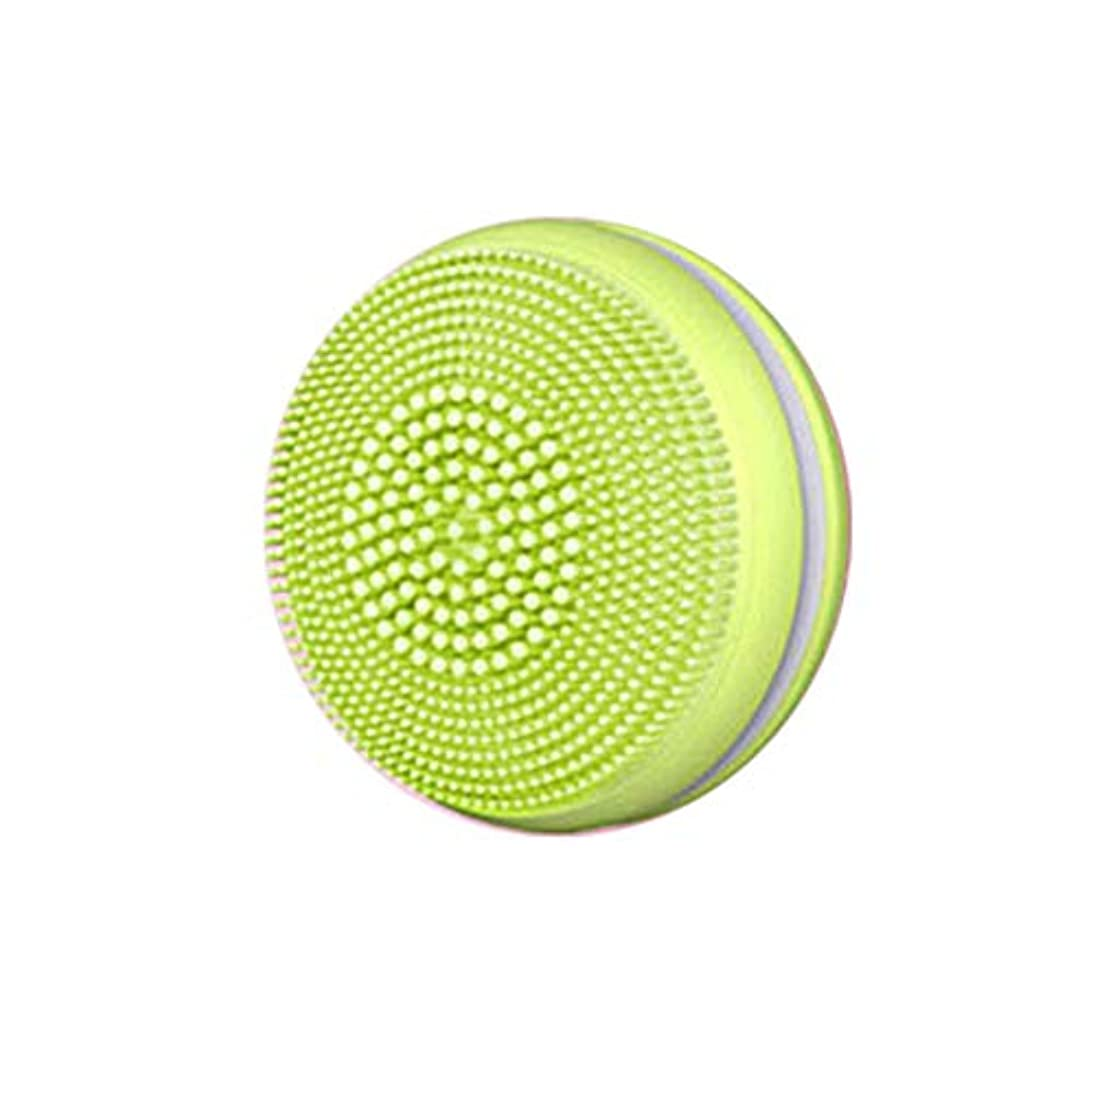 JanusSaja 1ピース電気フェイシャルブラシクレンザー超音波シリコーンフェイシャルマッサージ